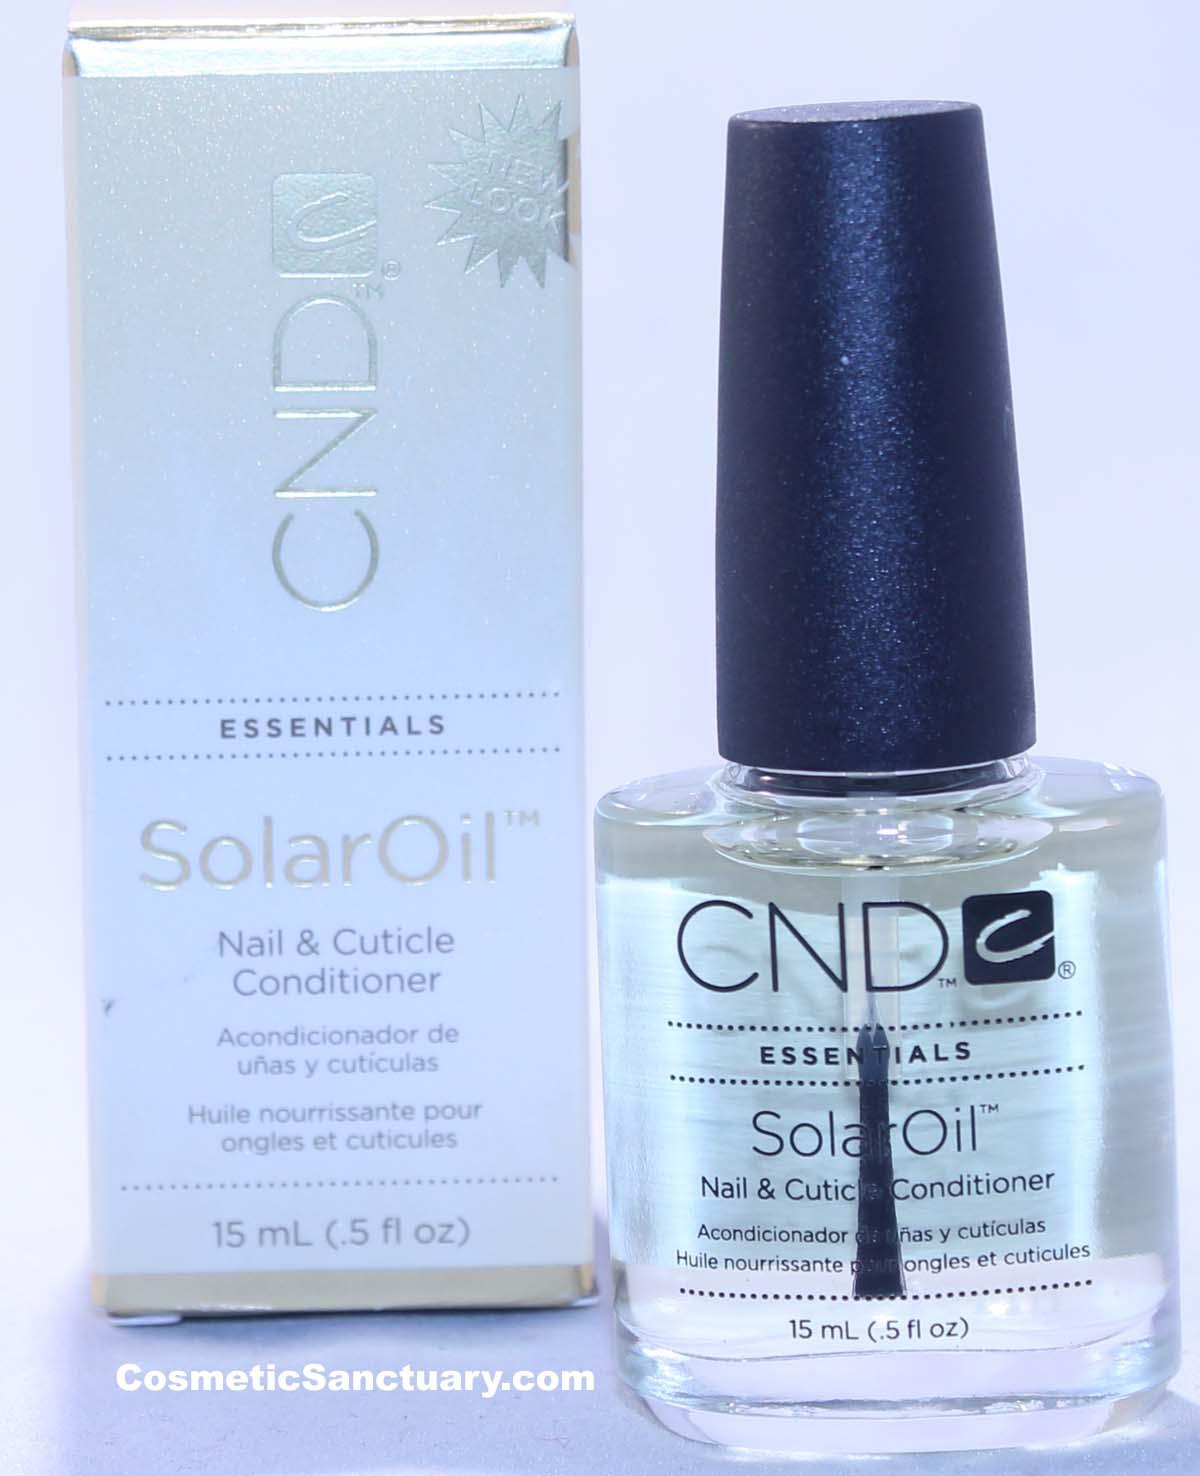 Creative nail design solar oil cnd creative nail design solaroil cnd creative nail design treatment cuticle solar oil oz view images prinsesfo Gallery